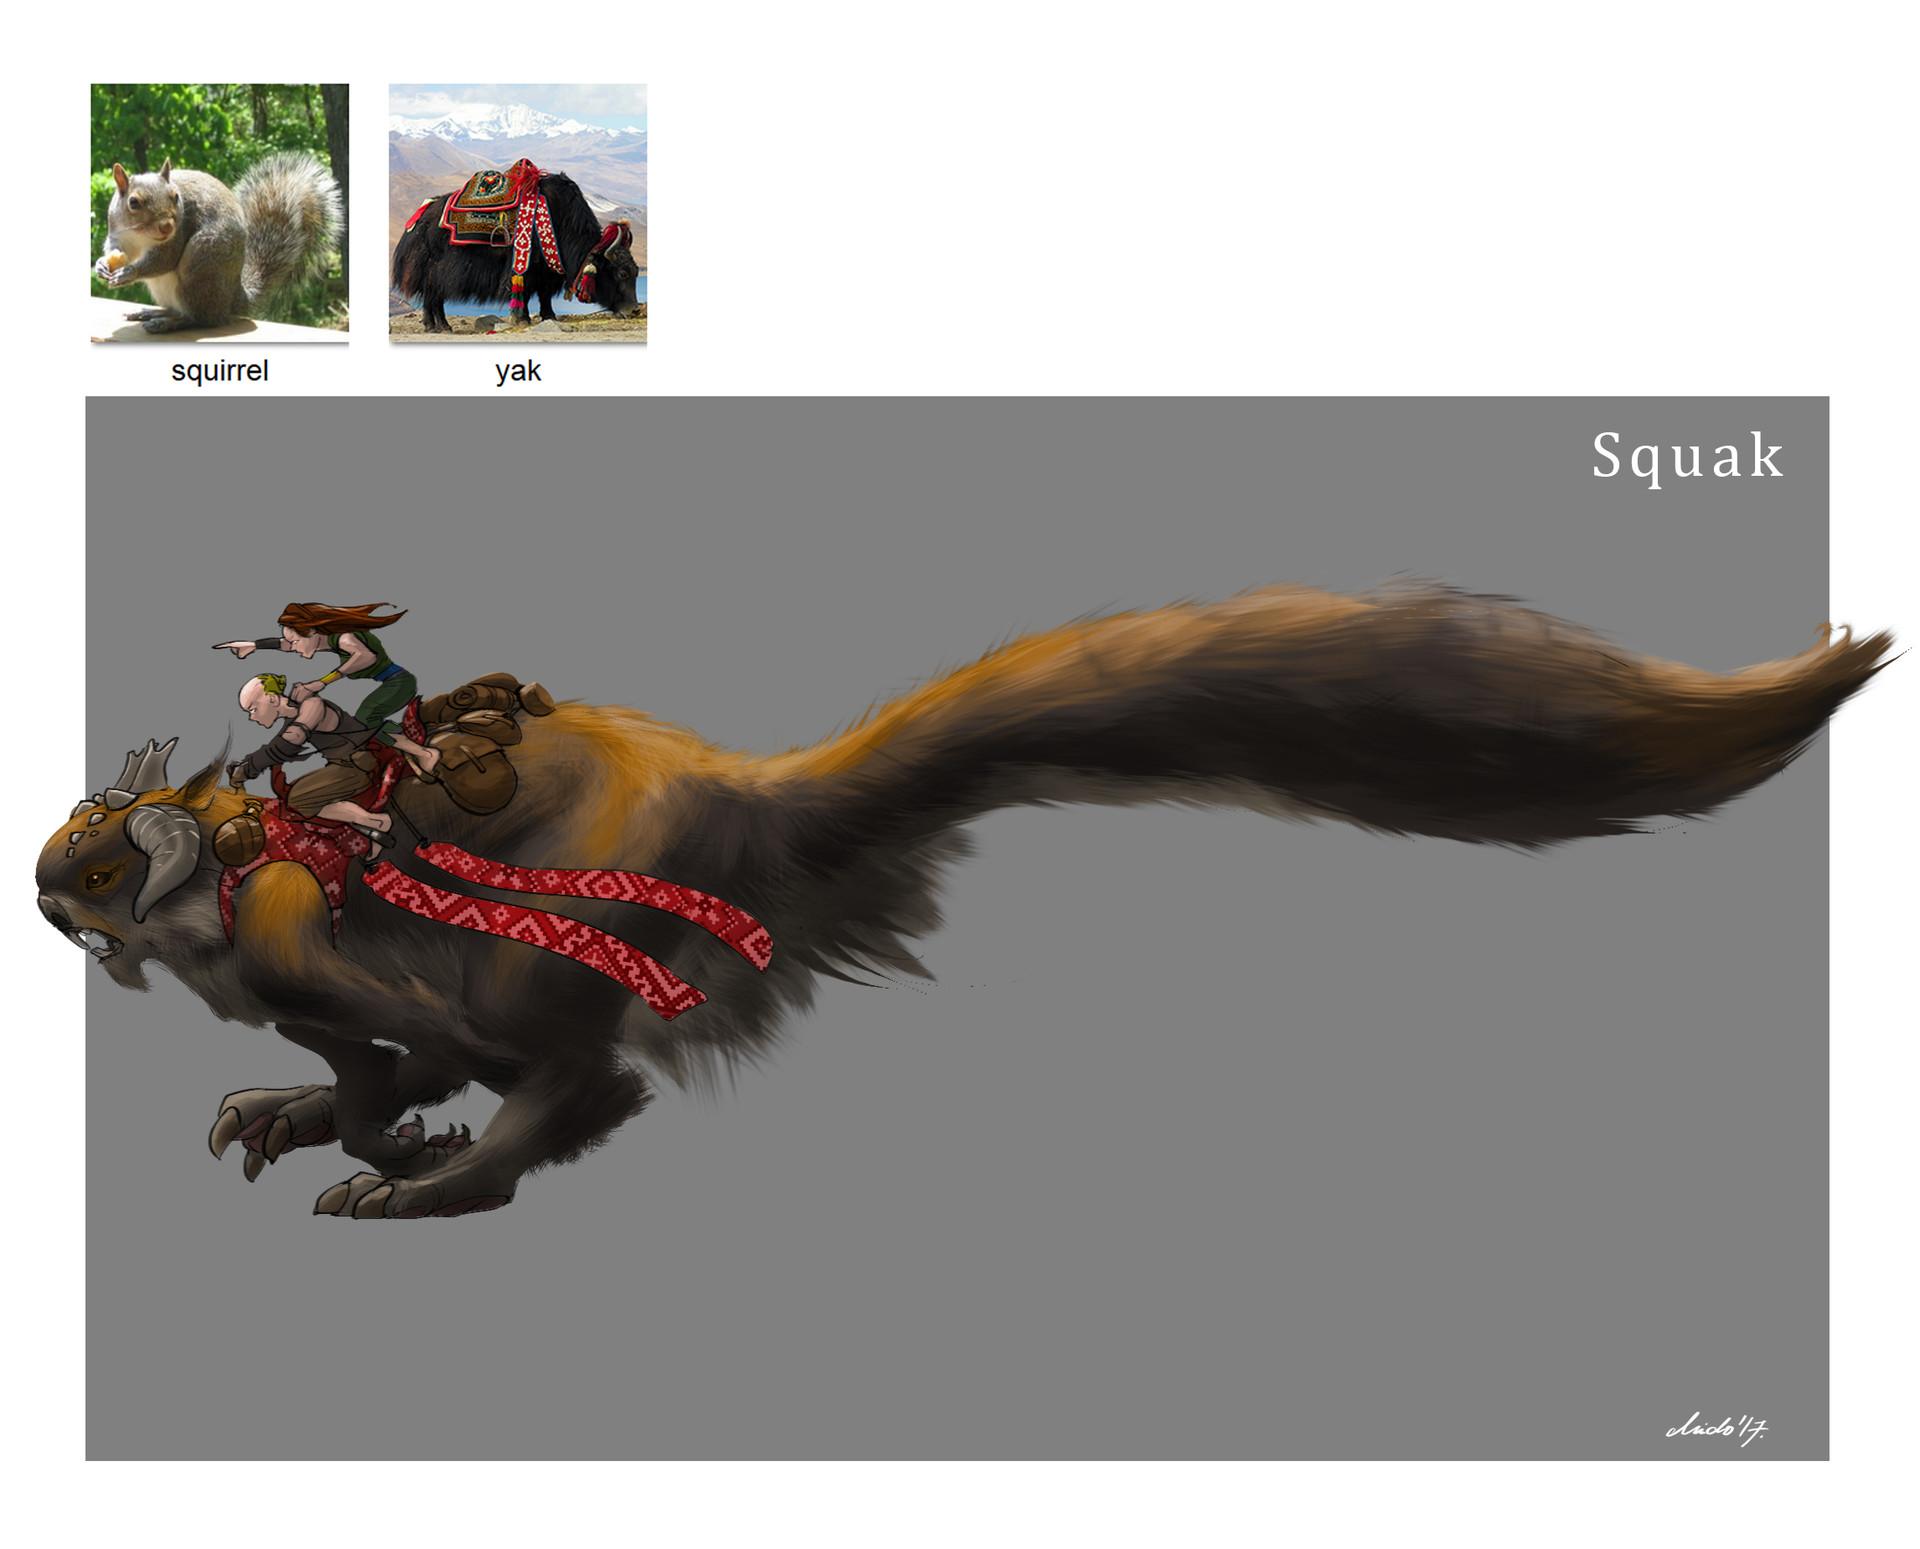 Midhat kapetanovic random creature mashup 020 squak